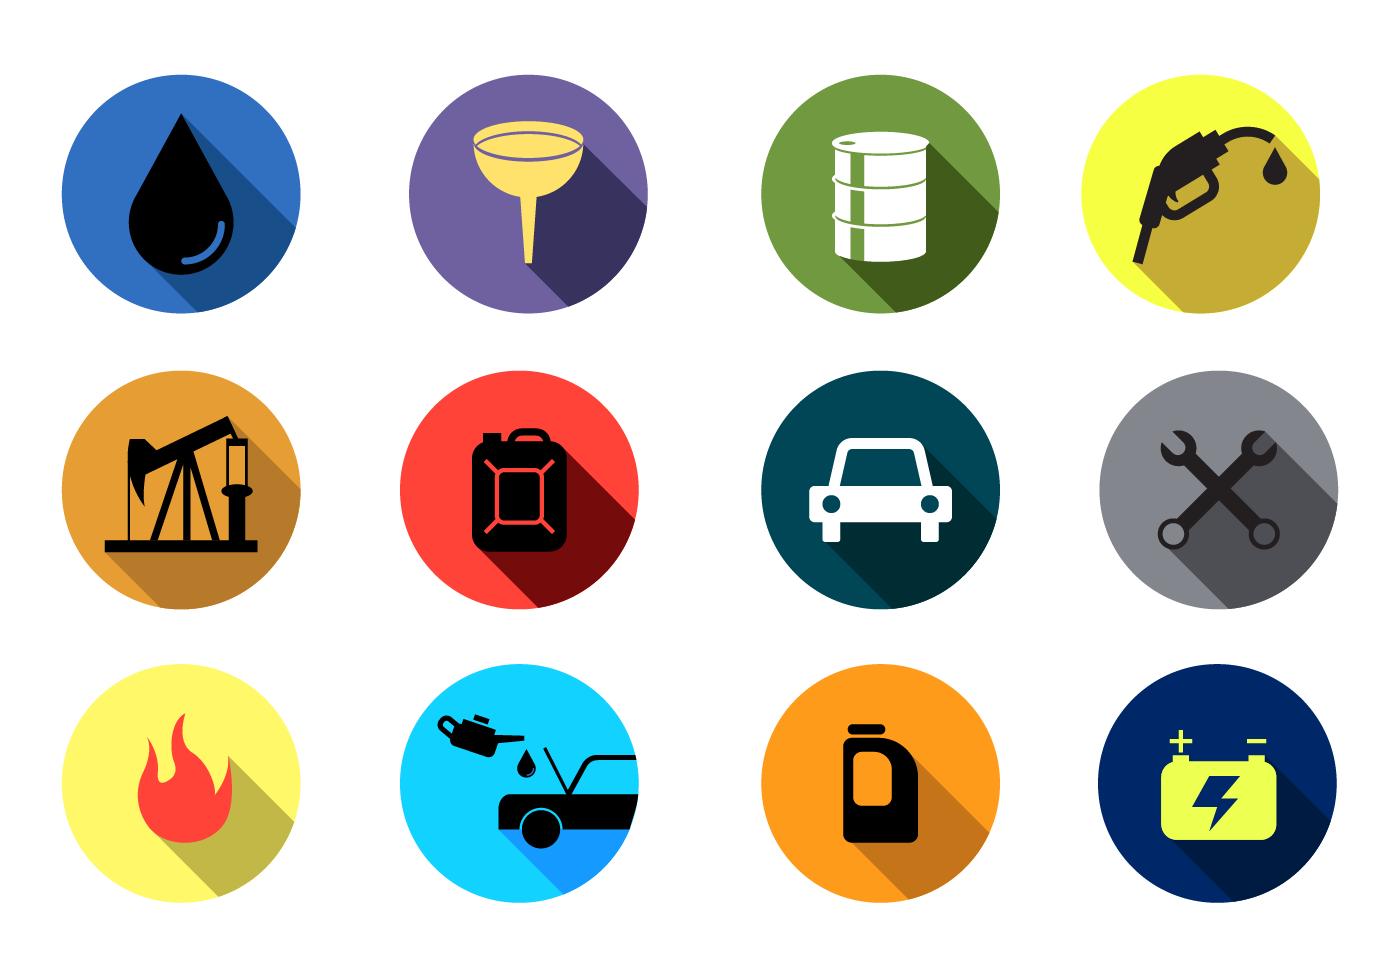 Oil Change Vector Icon Download Free Vector Art Stock